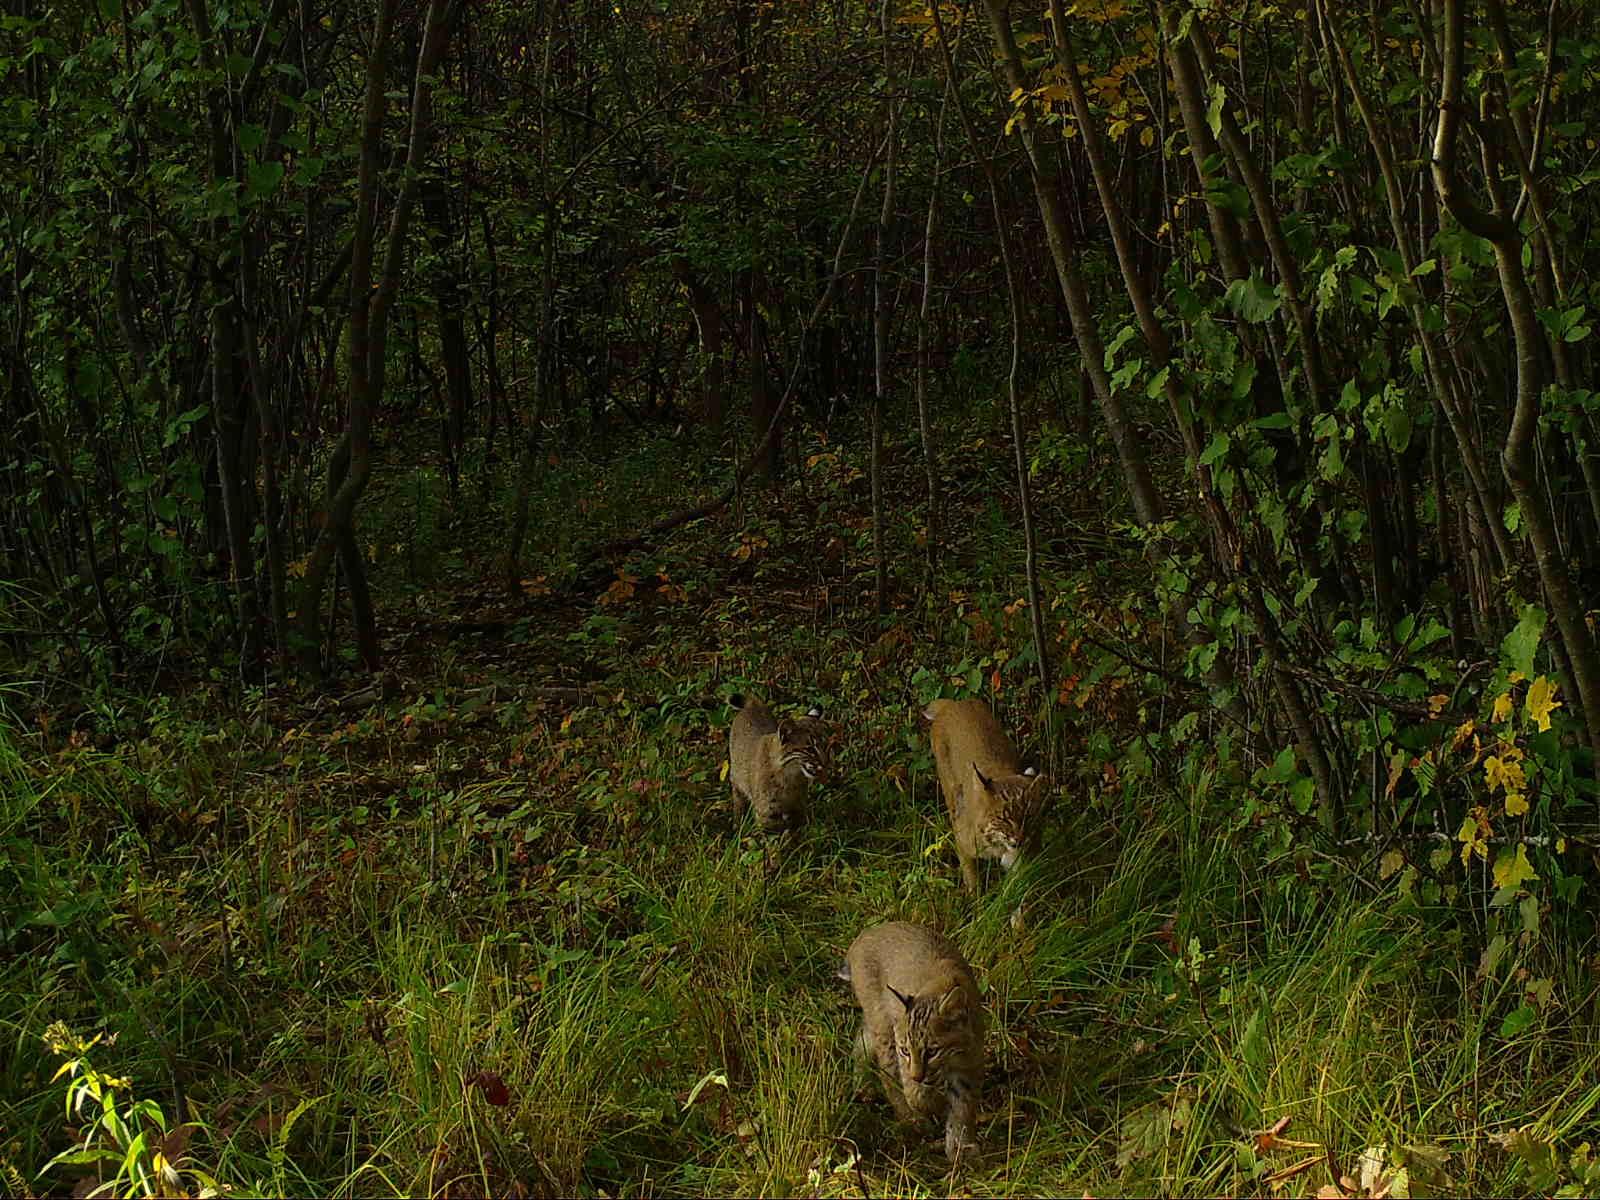 Bobcat kittens.